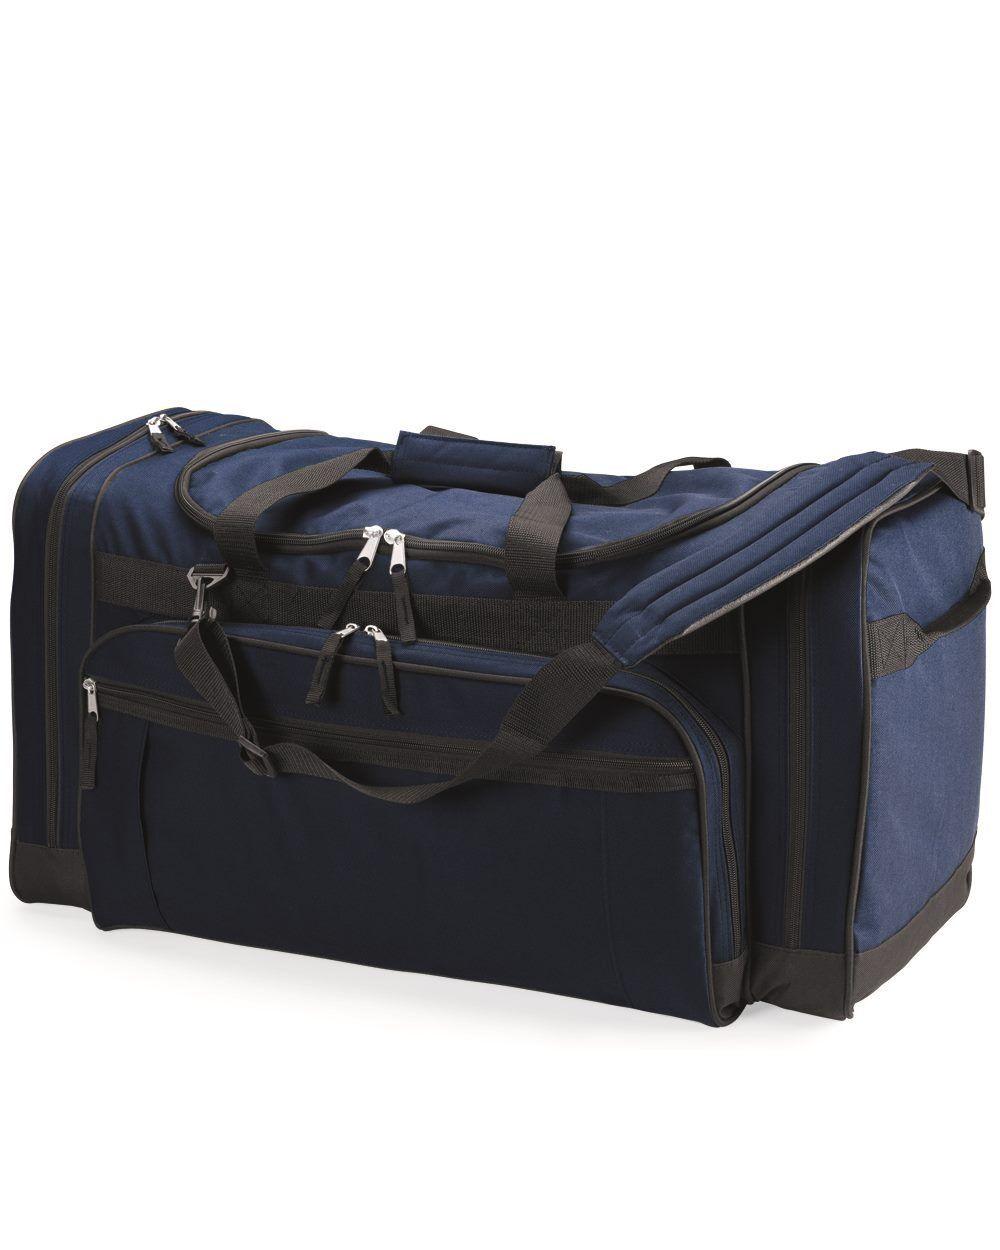 "Liberty Bags Explorer Large Duffle Gym Bag 3906 27"" x 13"" x"